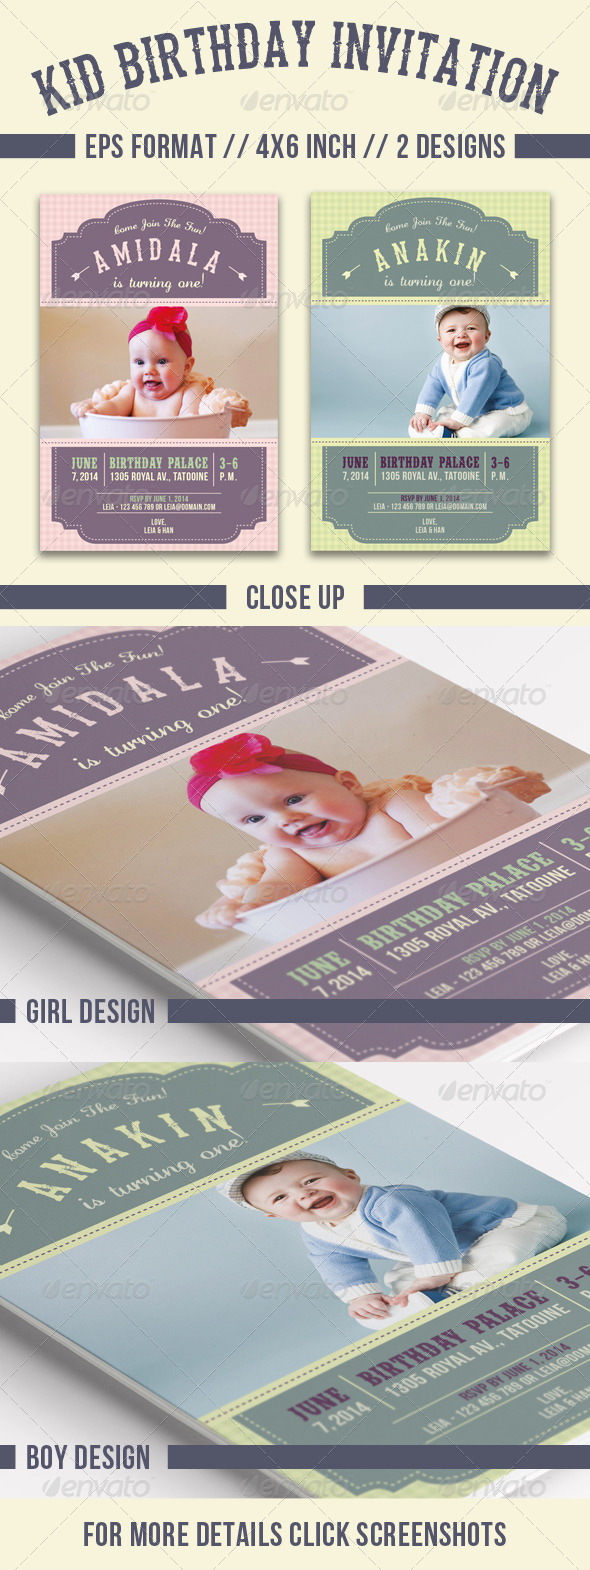 GraphicRiver Kid Birthday Invitation 7794285